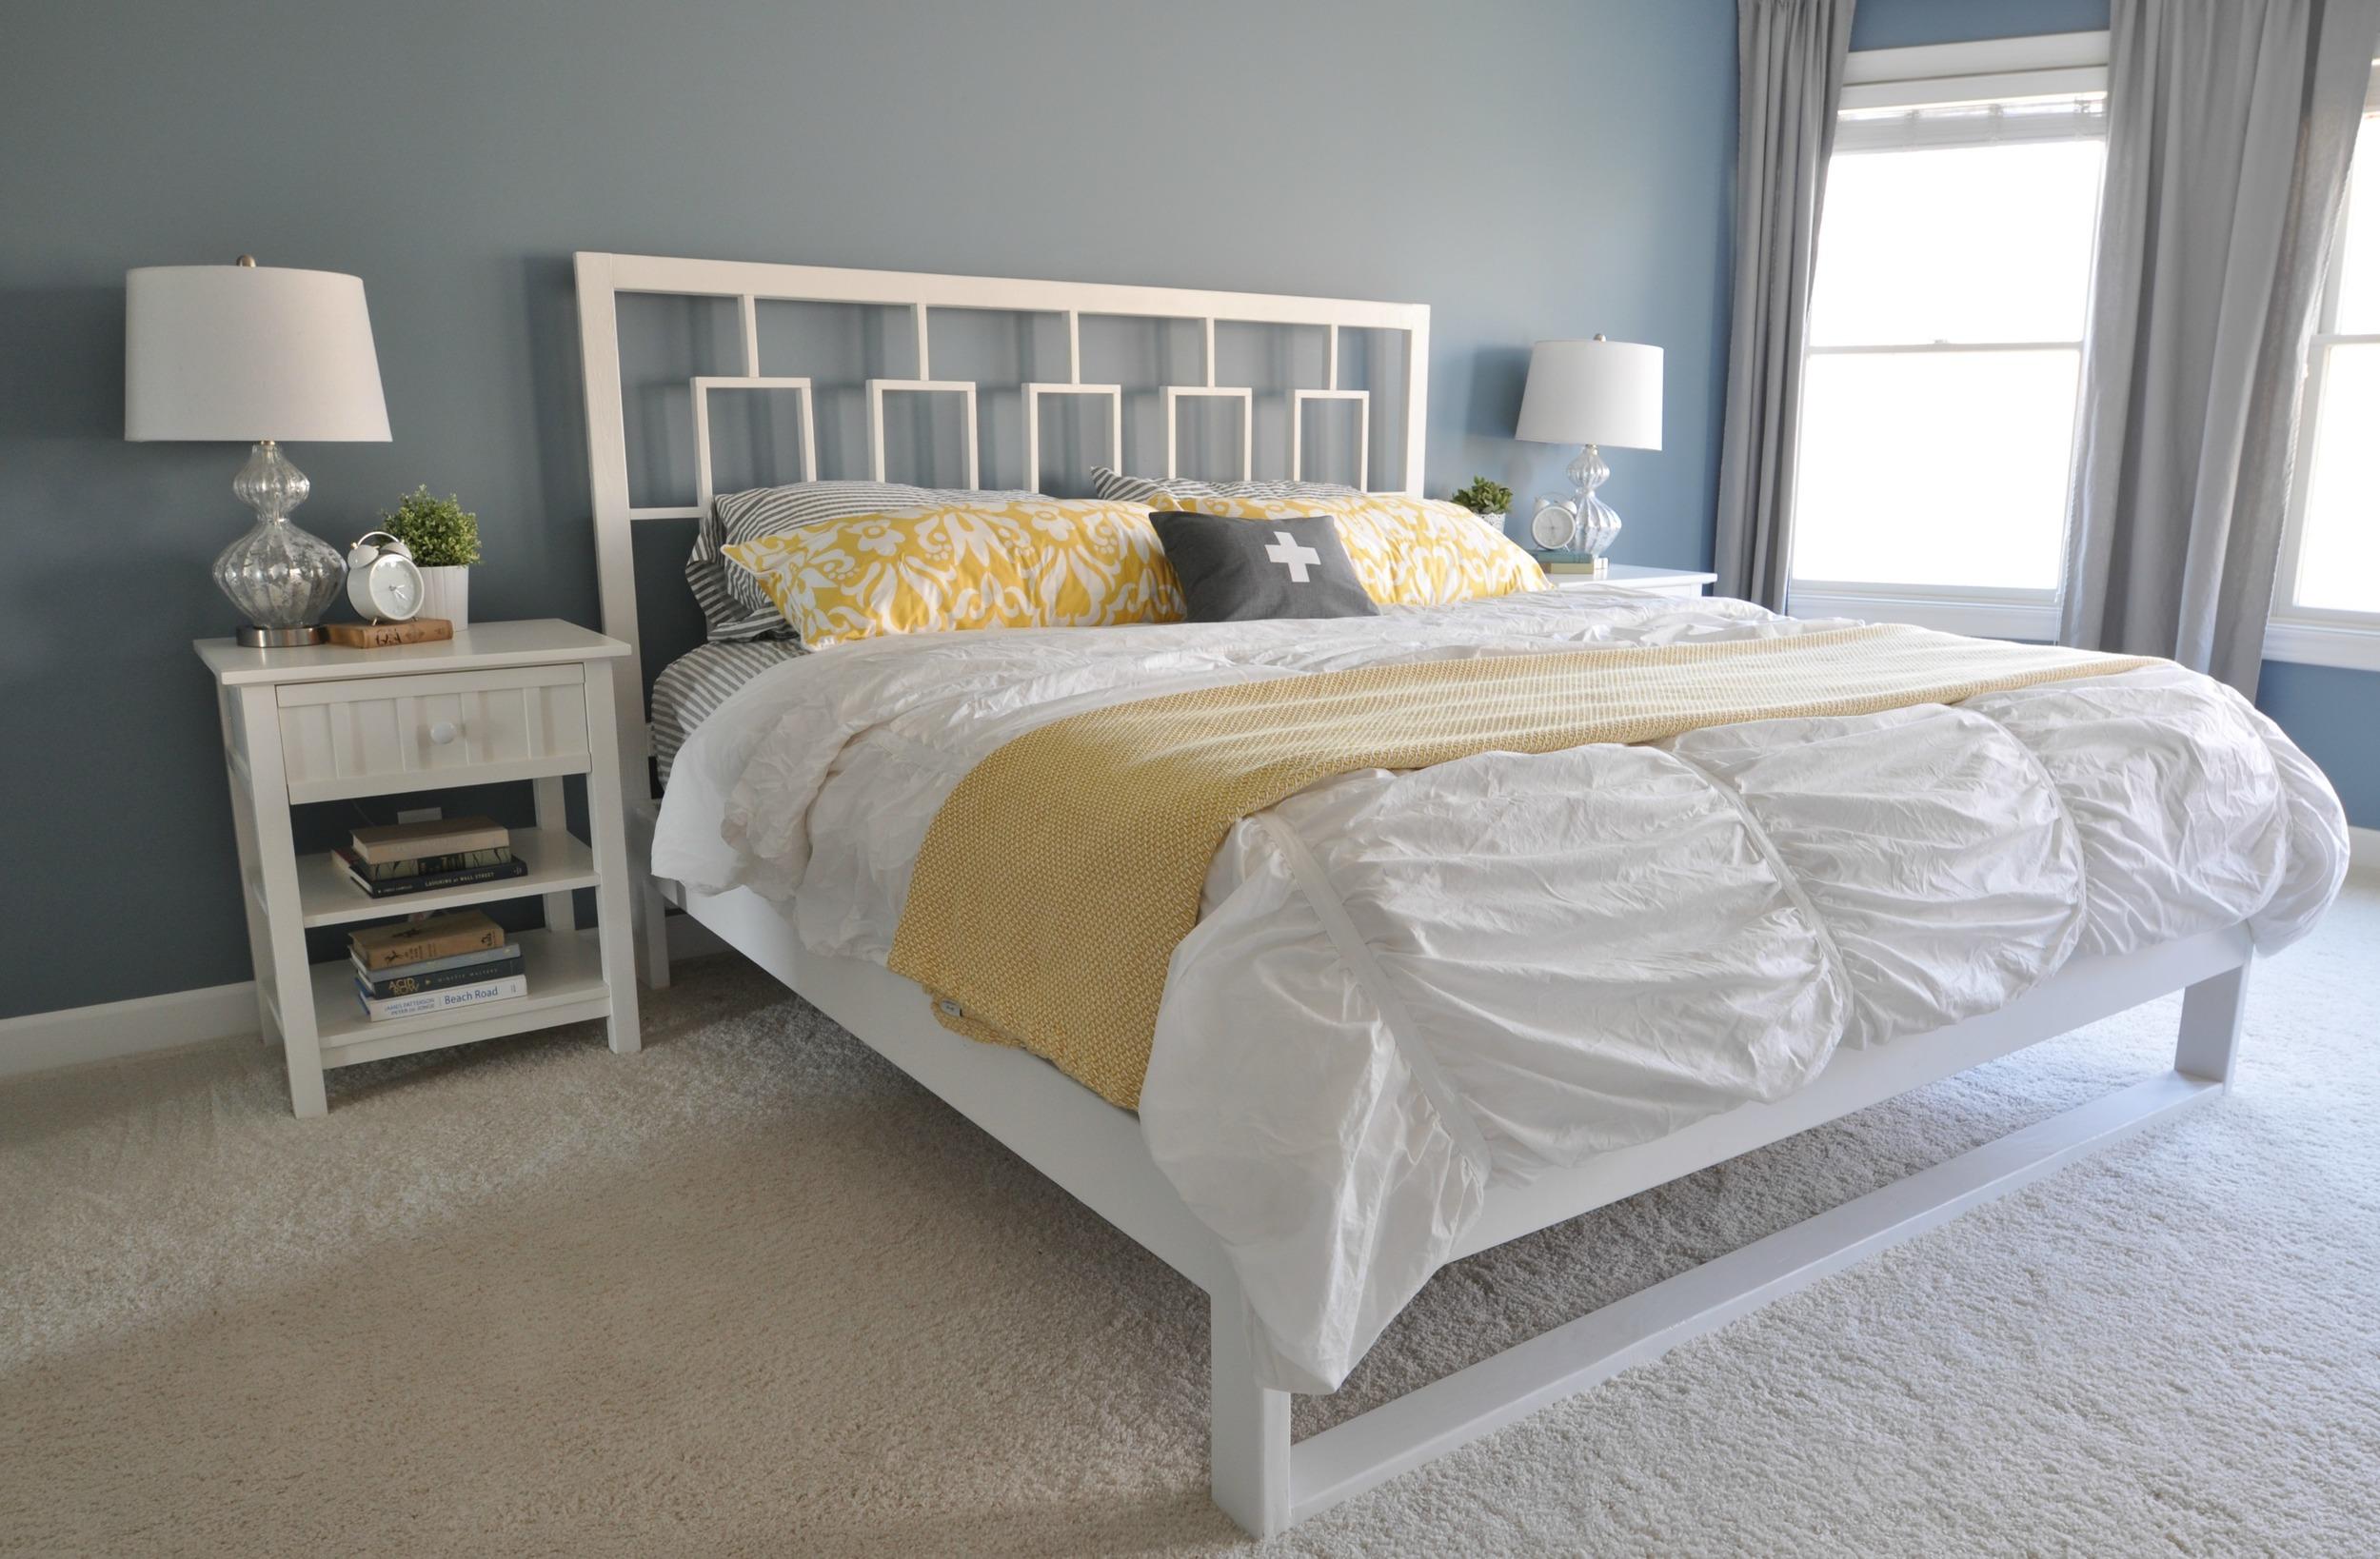 Crane and Canopy Bedding